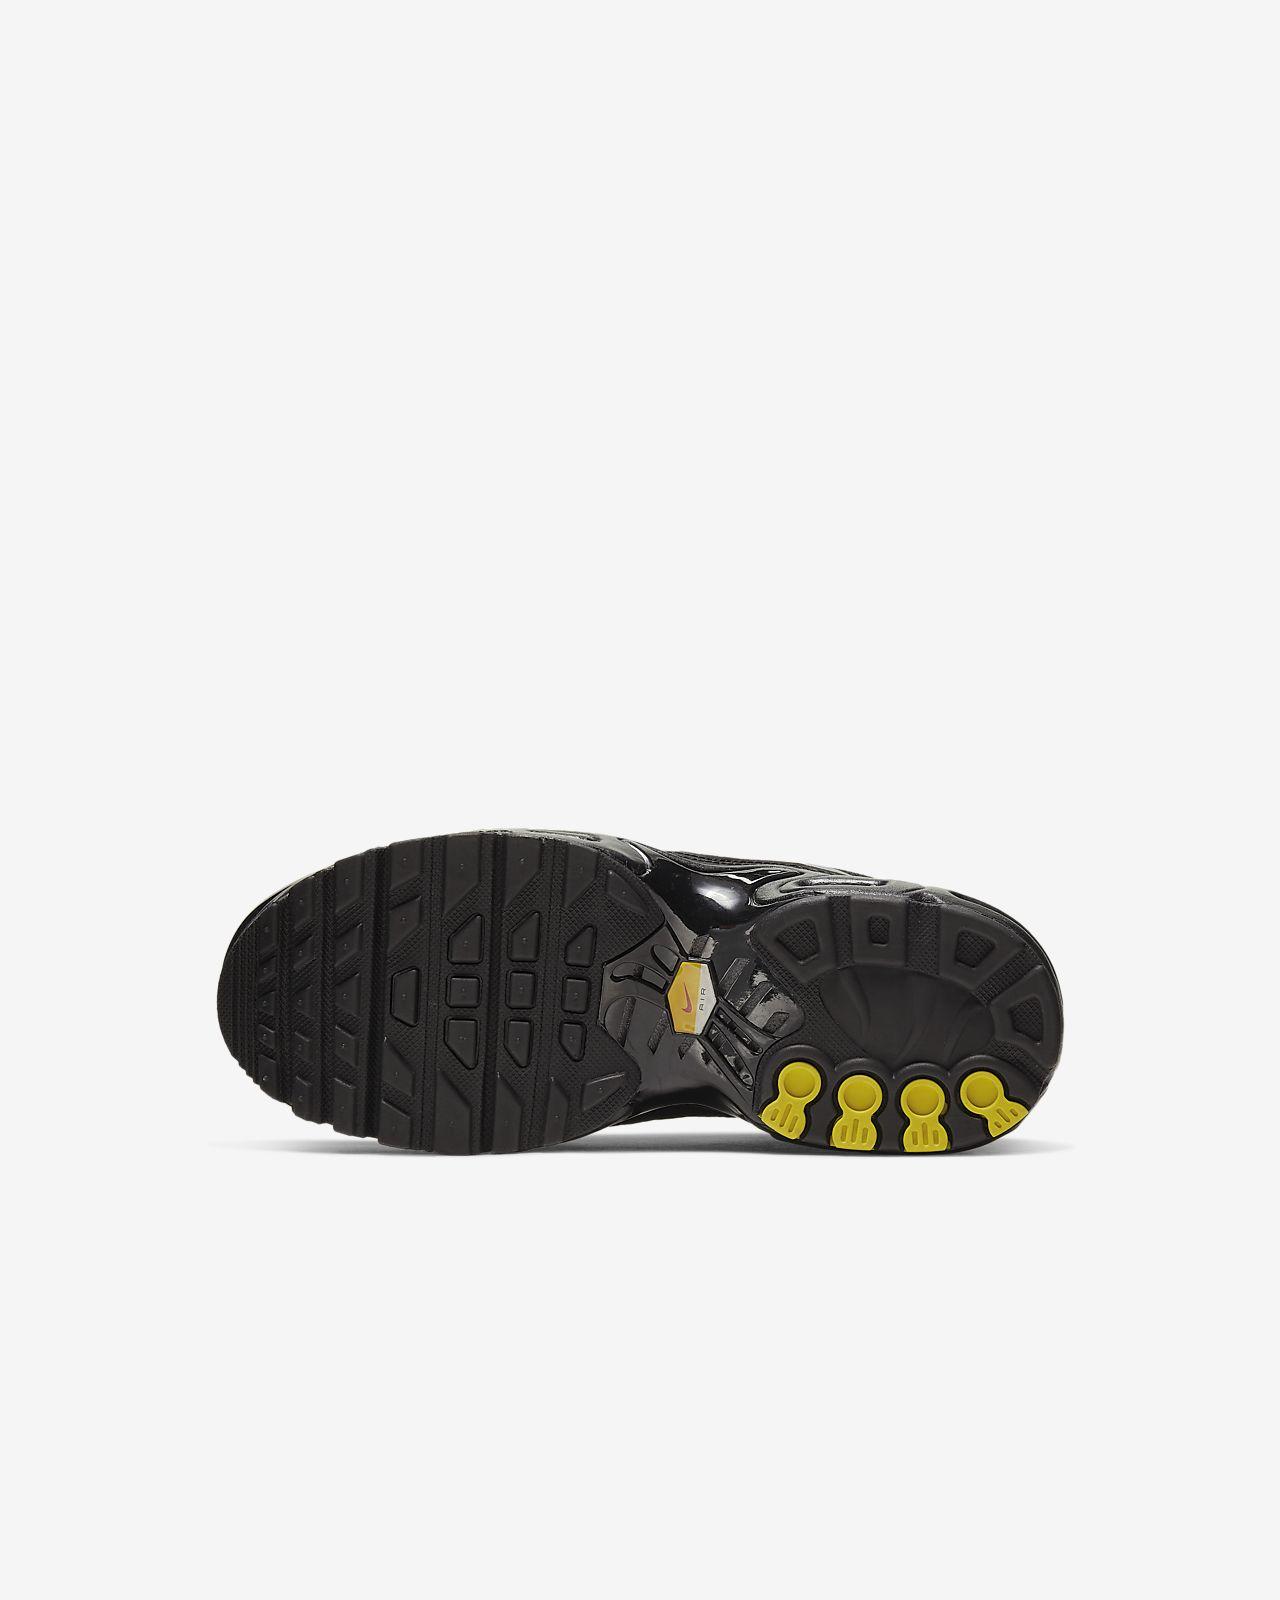 Sko Nike Air Max Plus för barn